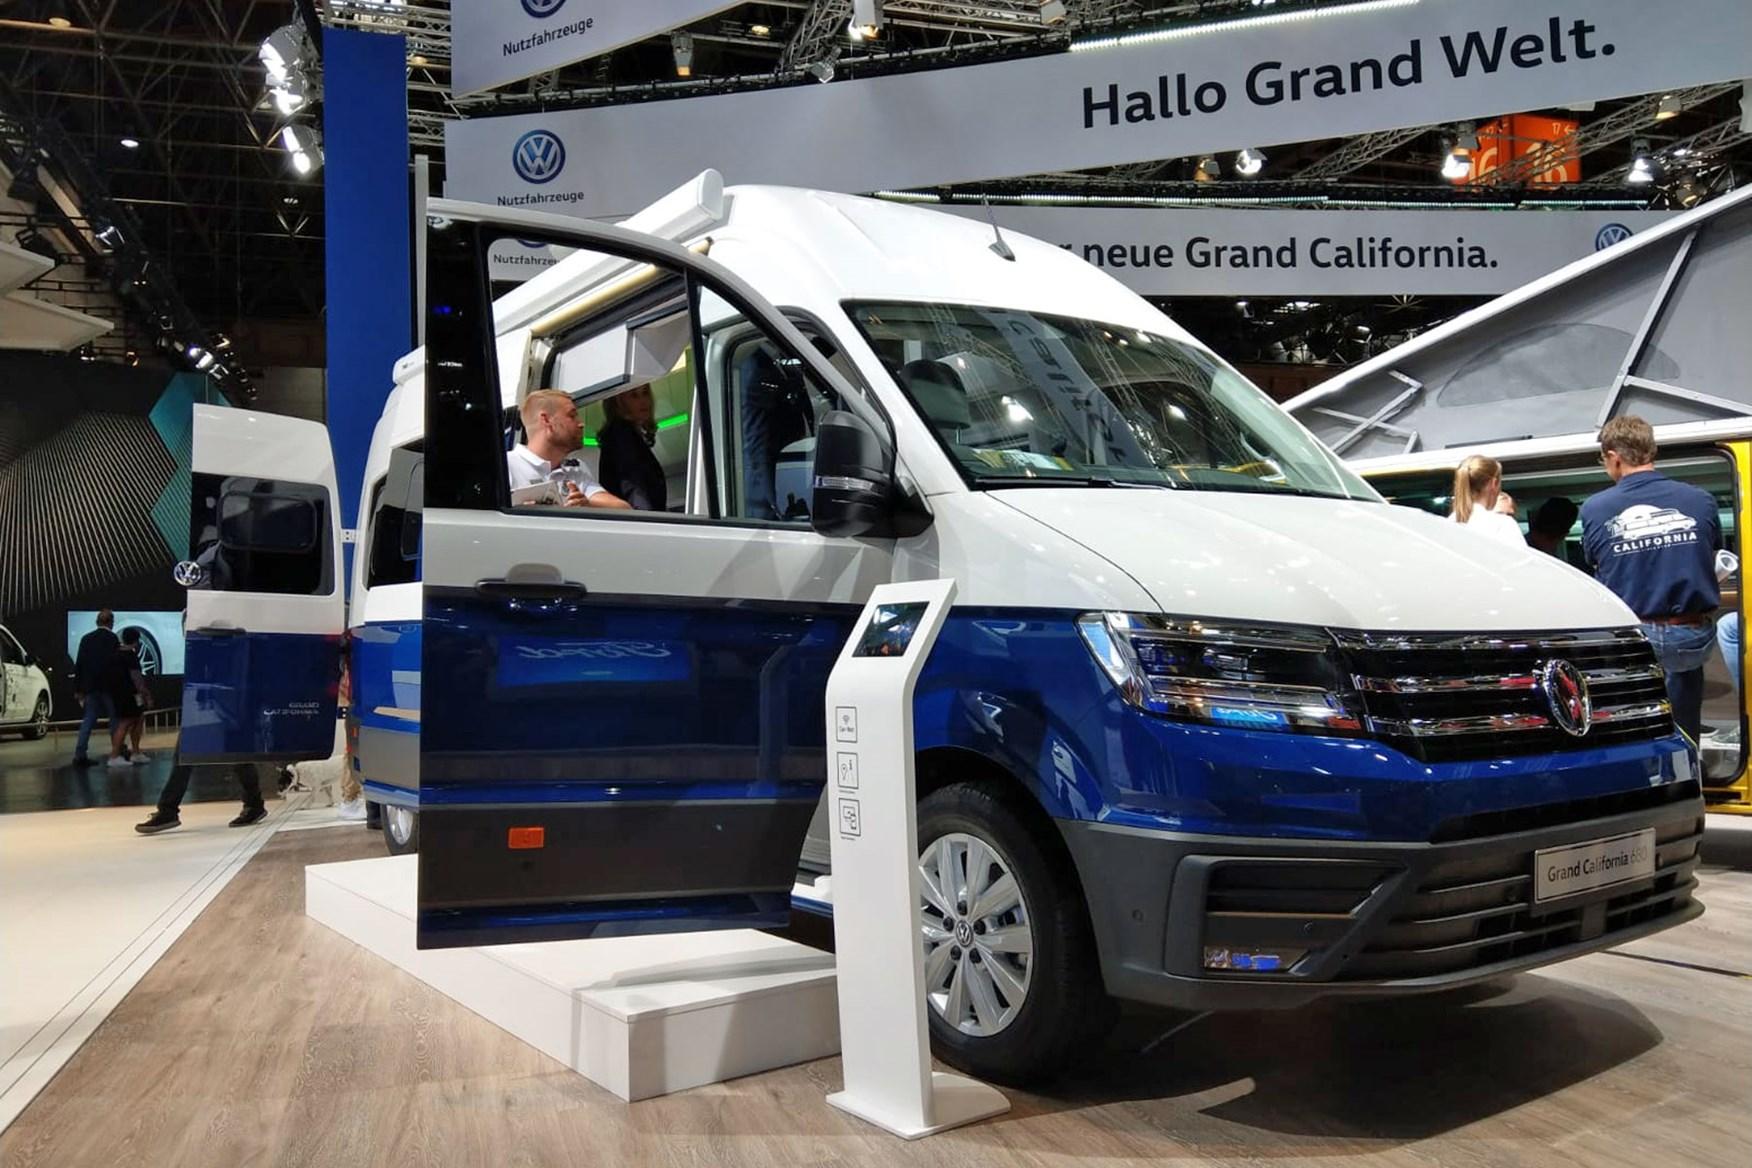 Vw Grand California 680 At The Dusseldorf Caravan Salon 2018